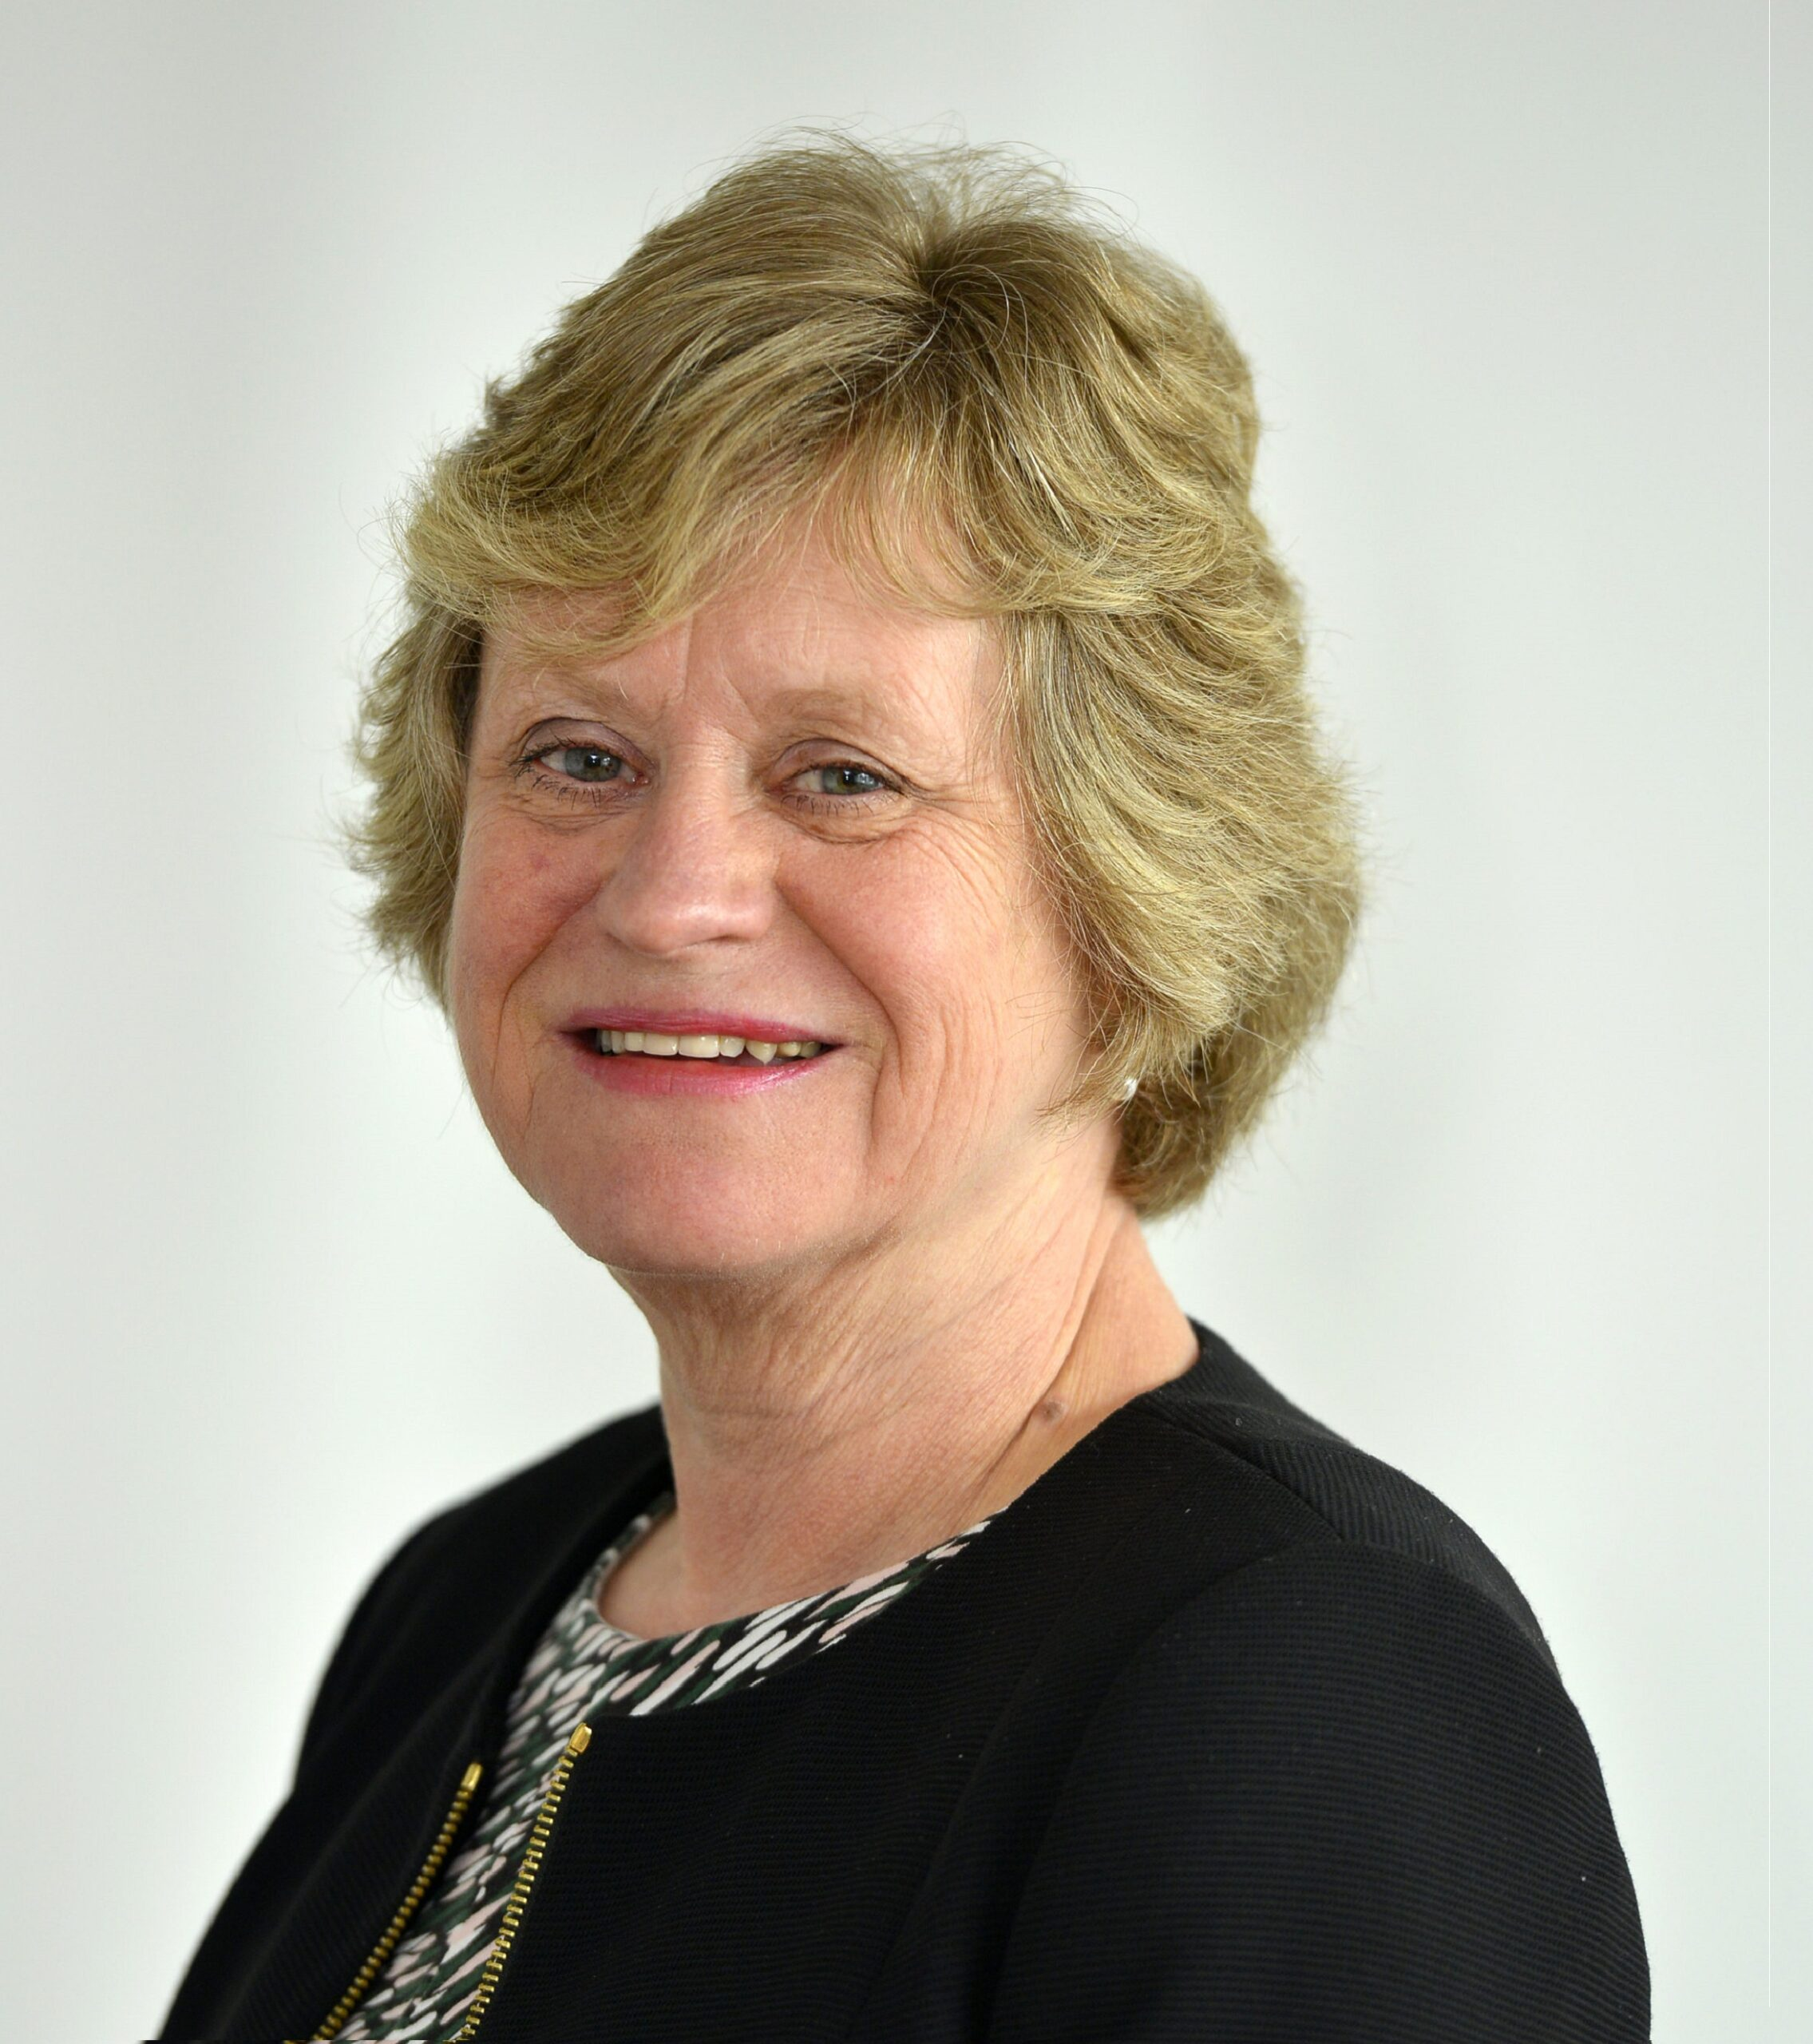 Barbara Nicholas